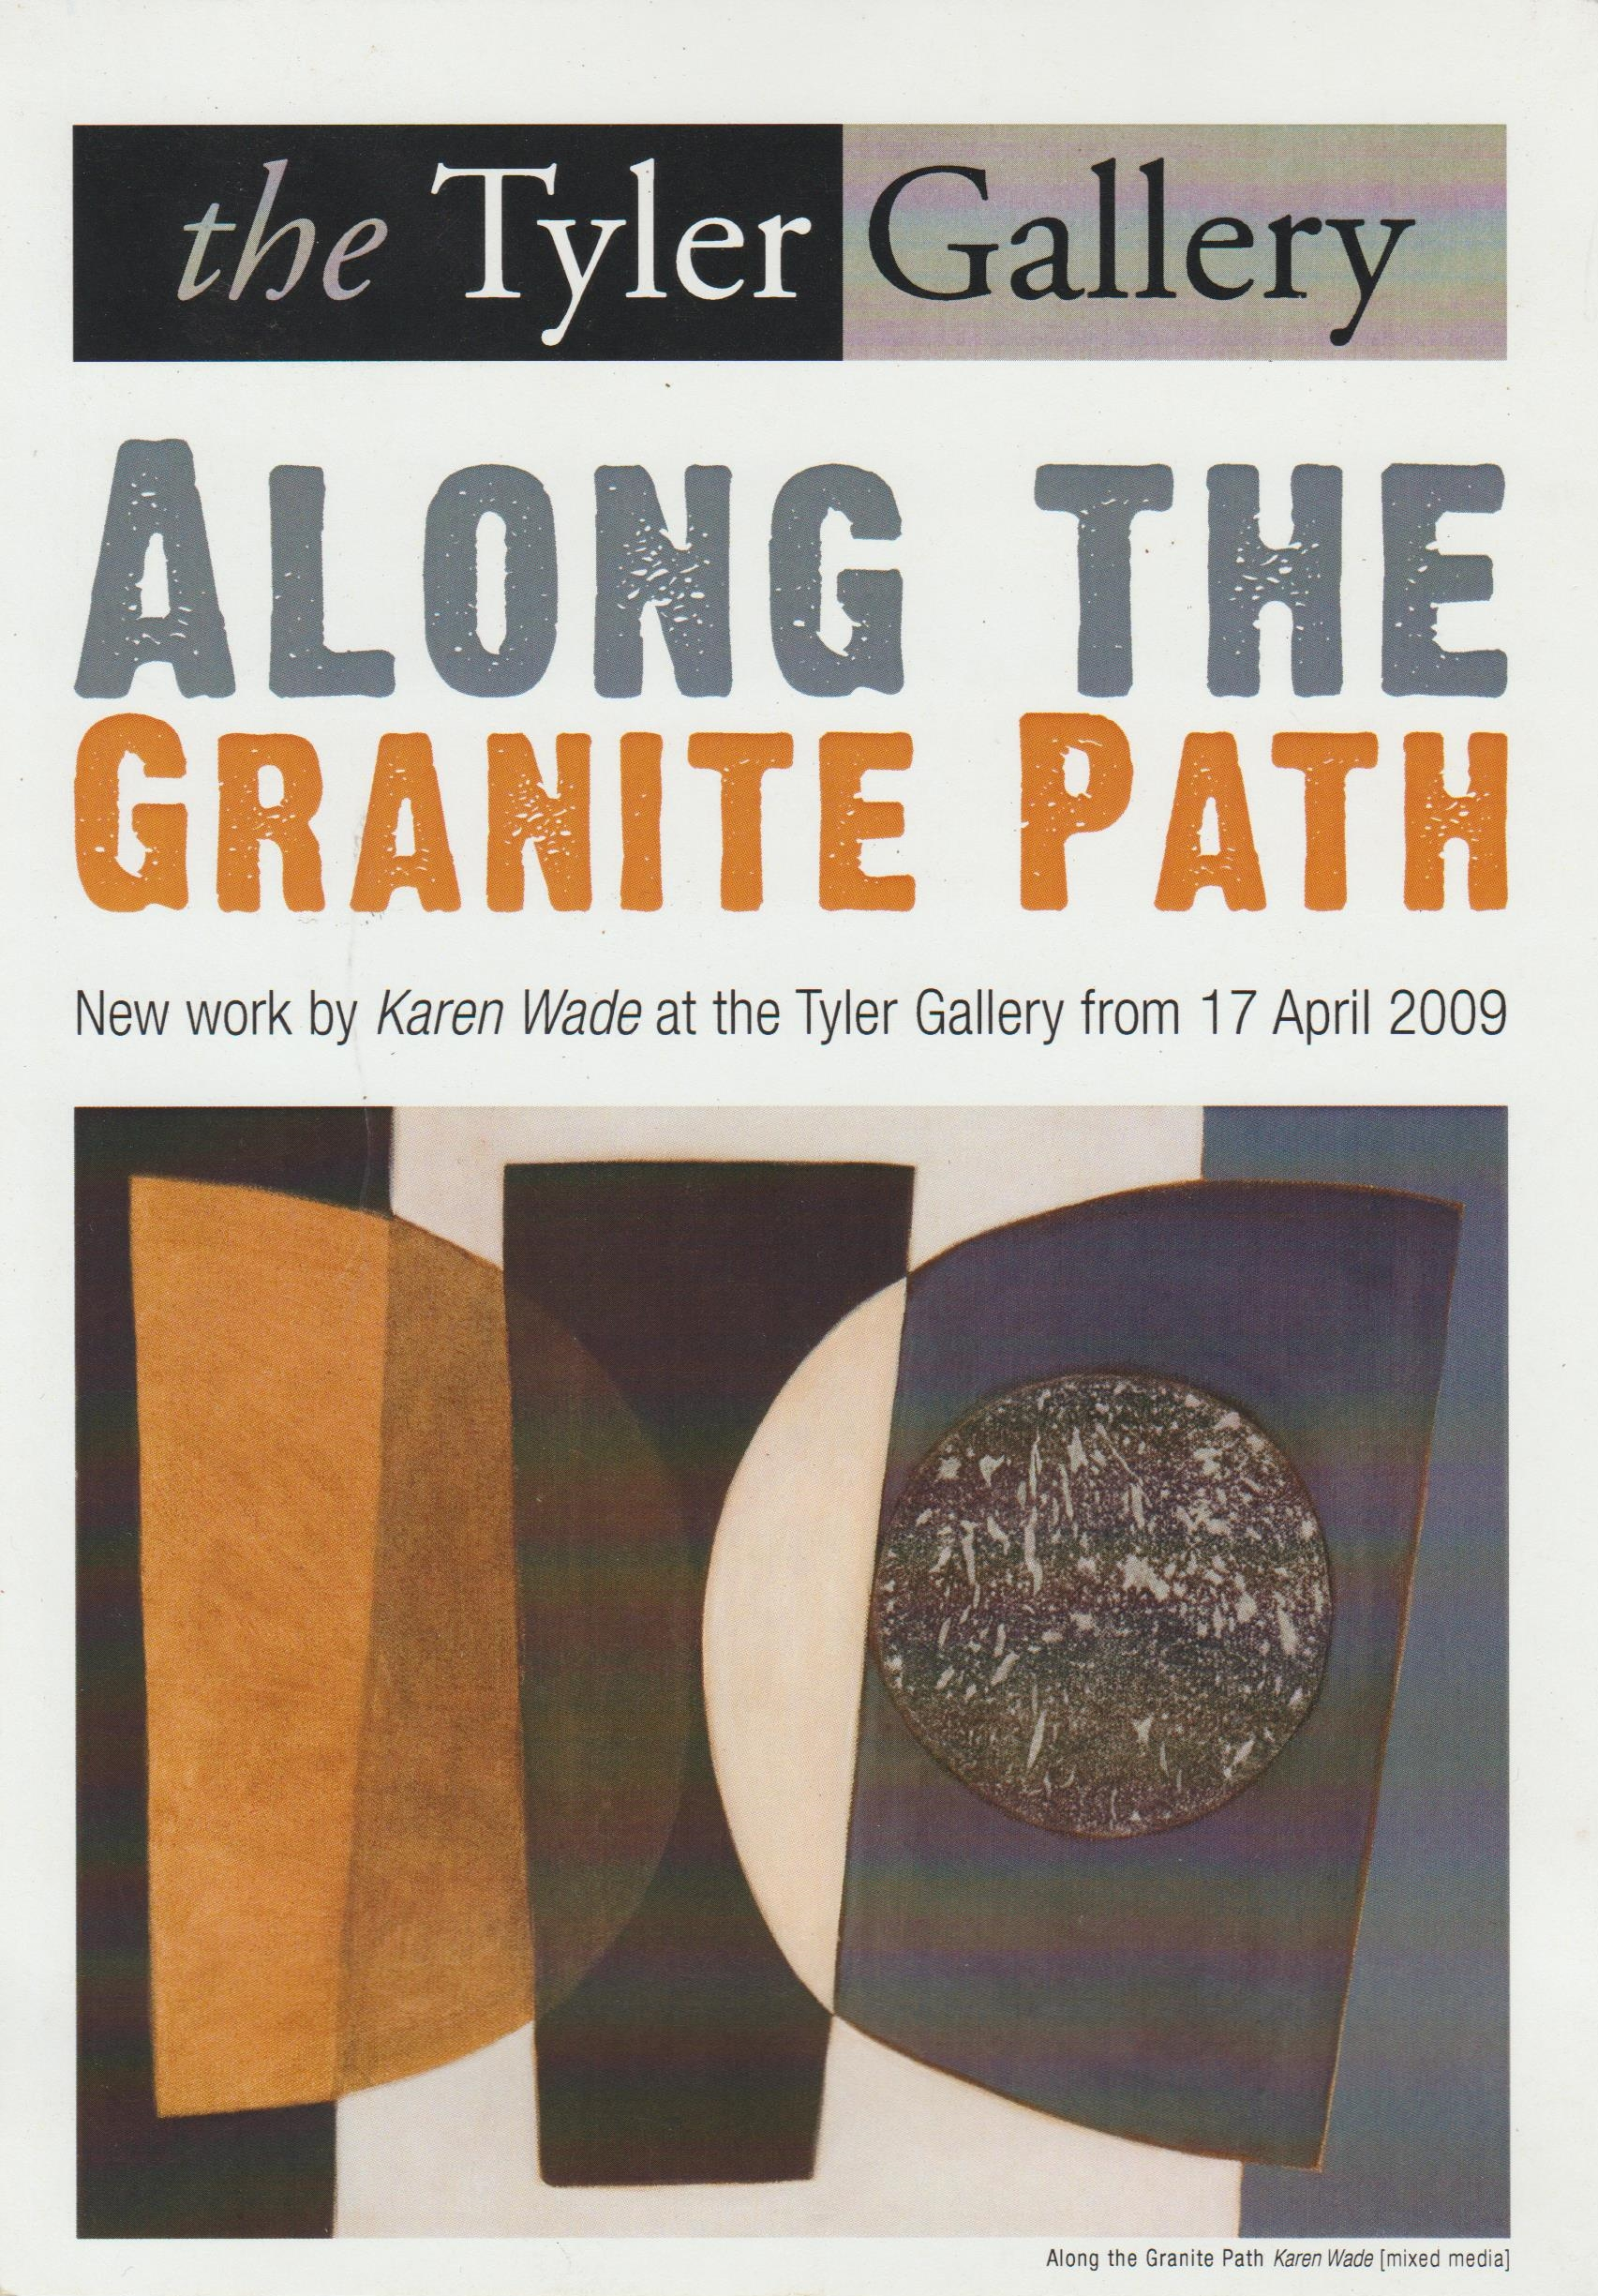 Along the Granite Path, Cornwall, 2009